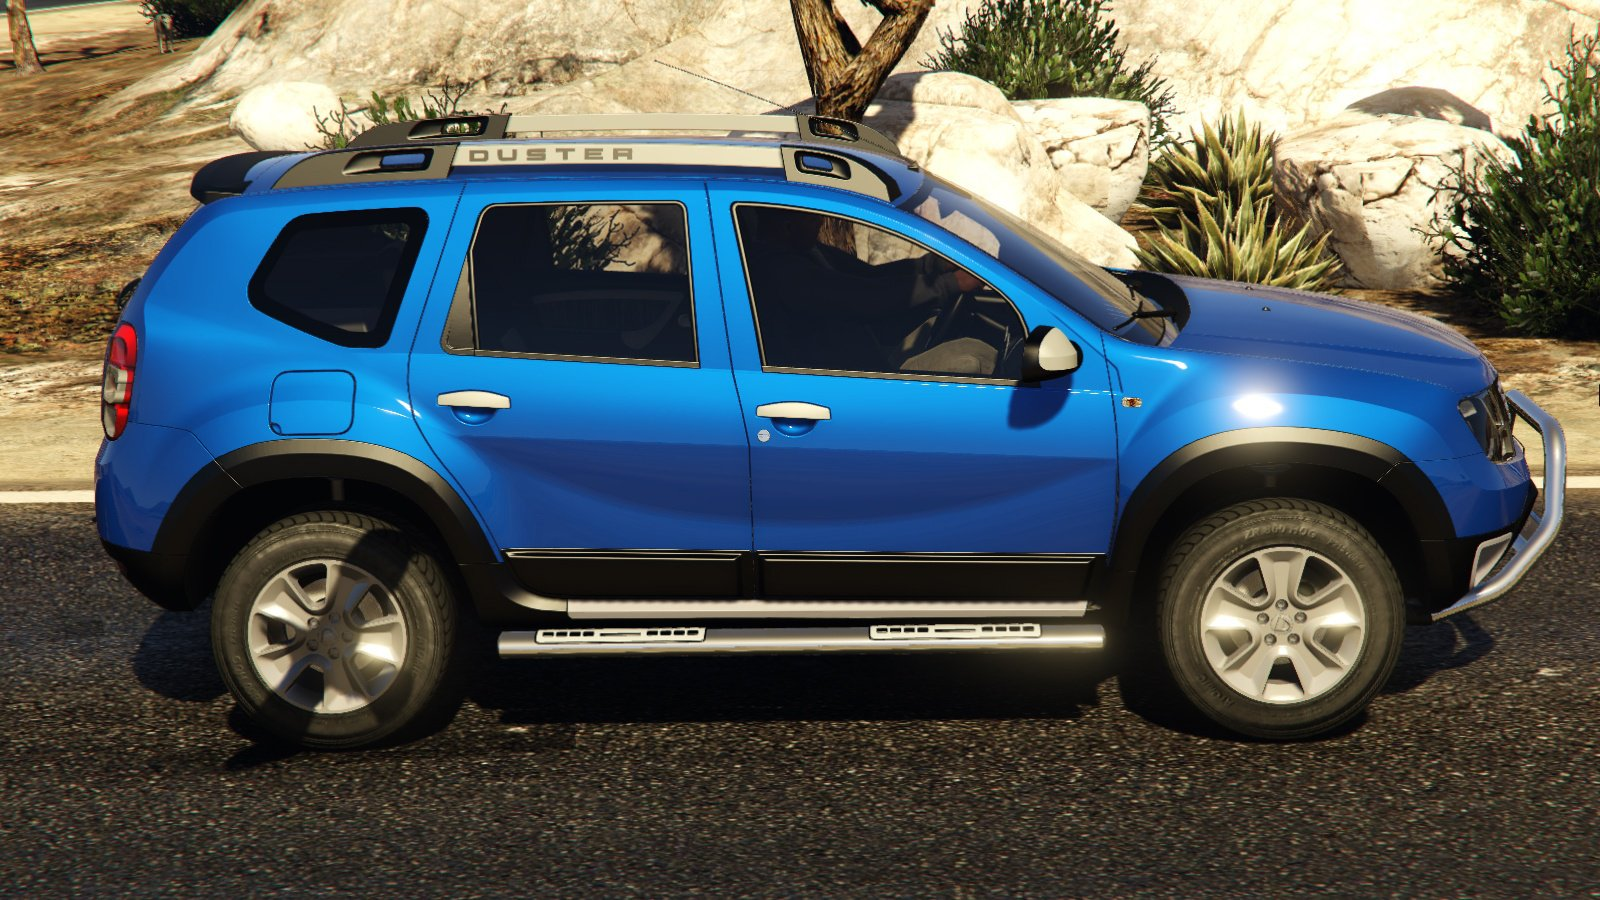 Dacia duster 2014 vehicules pour gta v sur gta modding for Dacia duster interni 2014